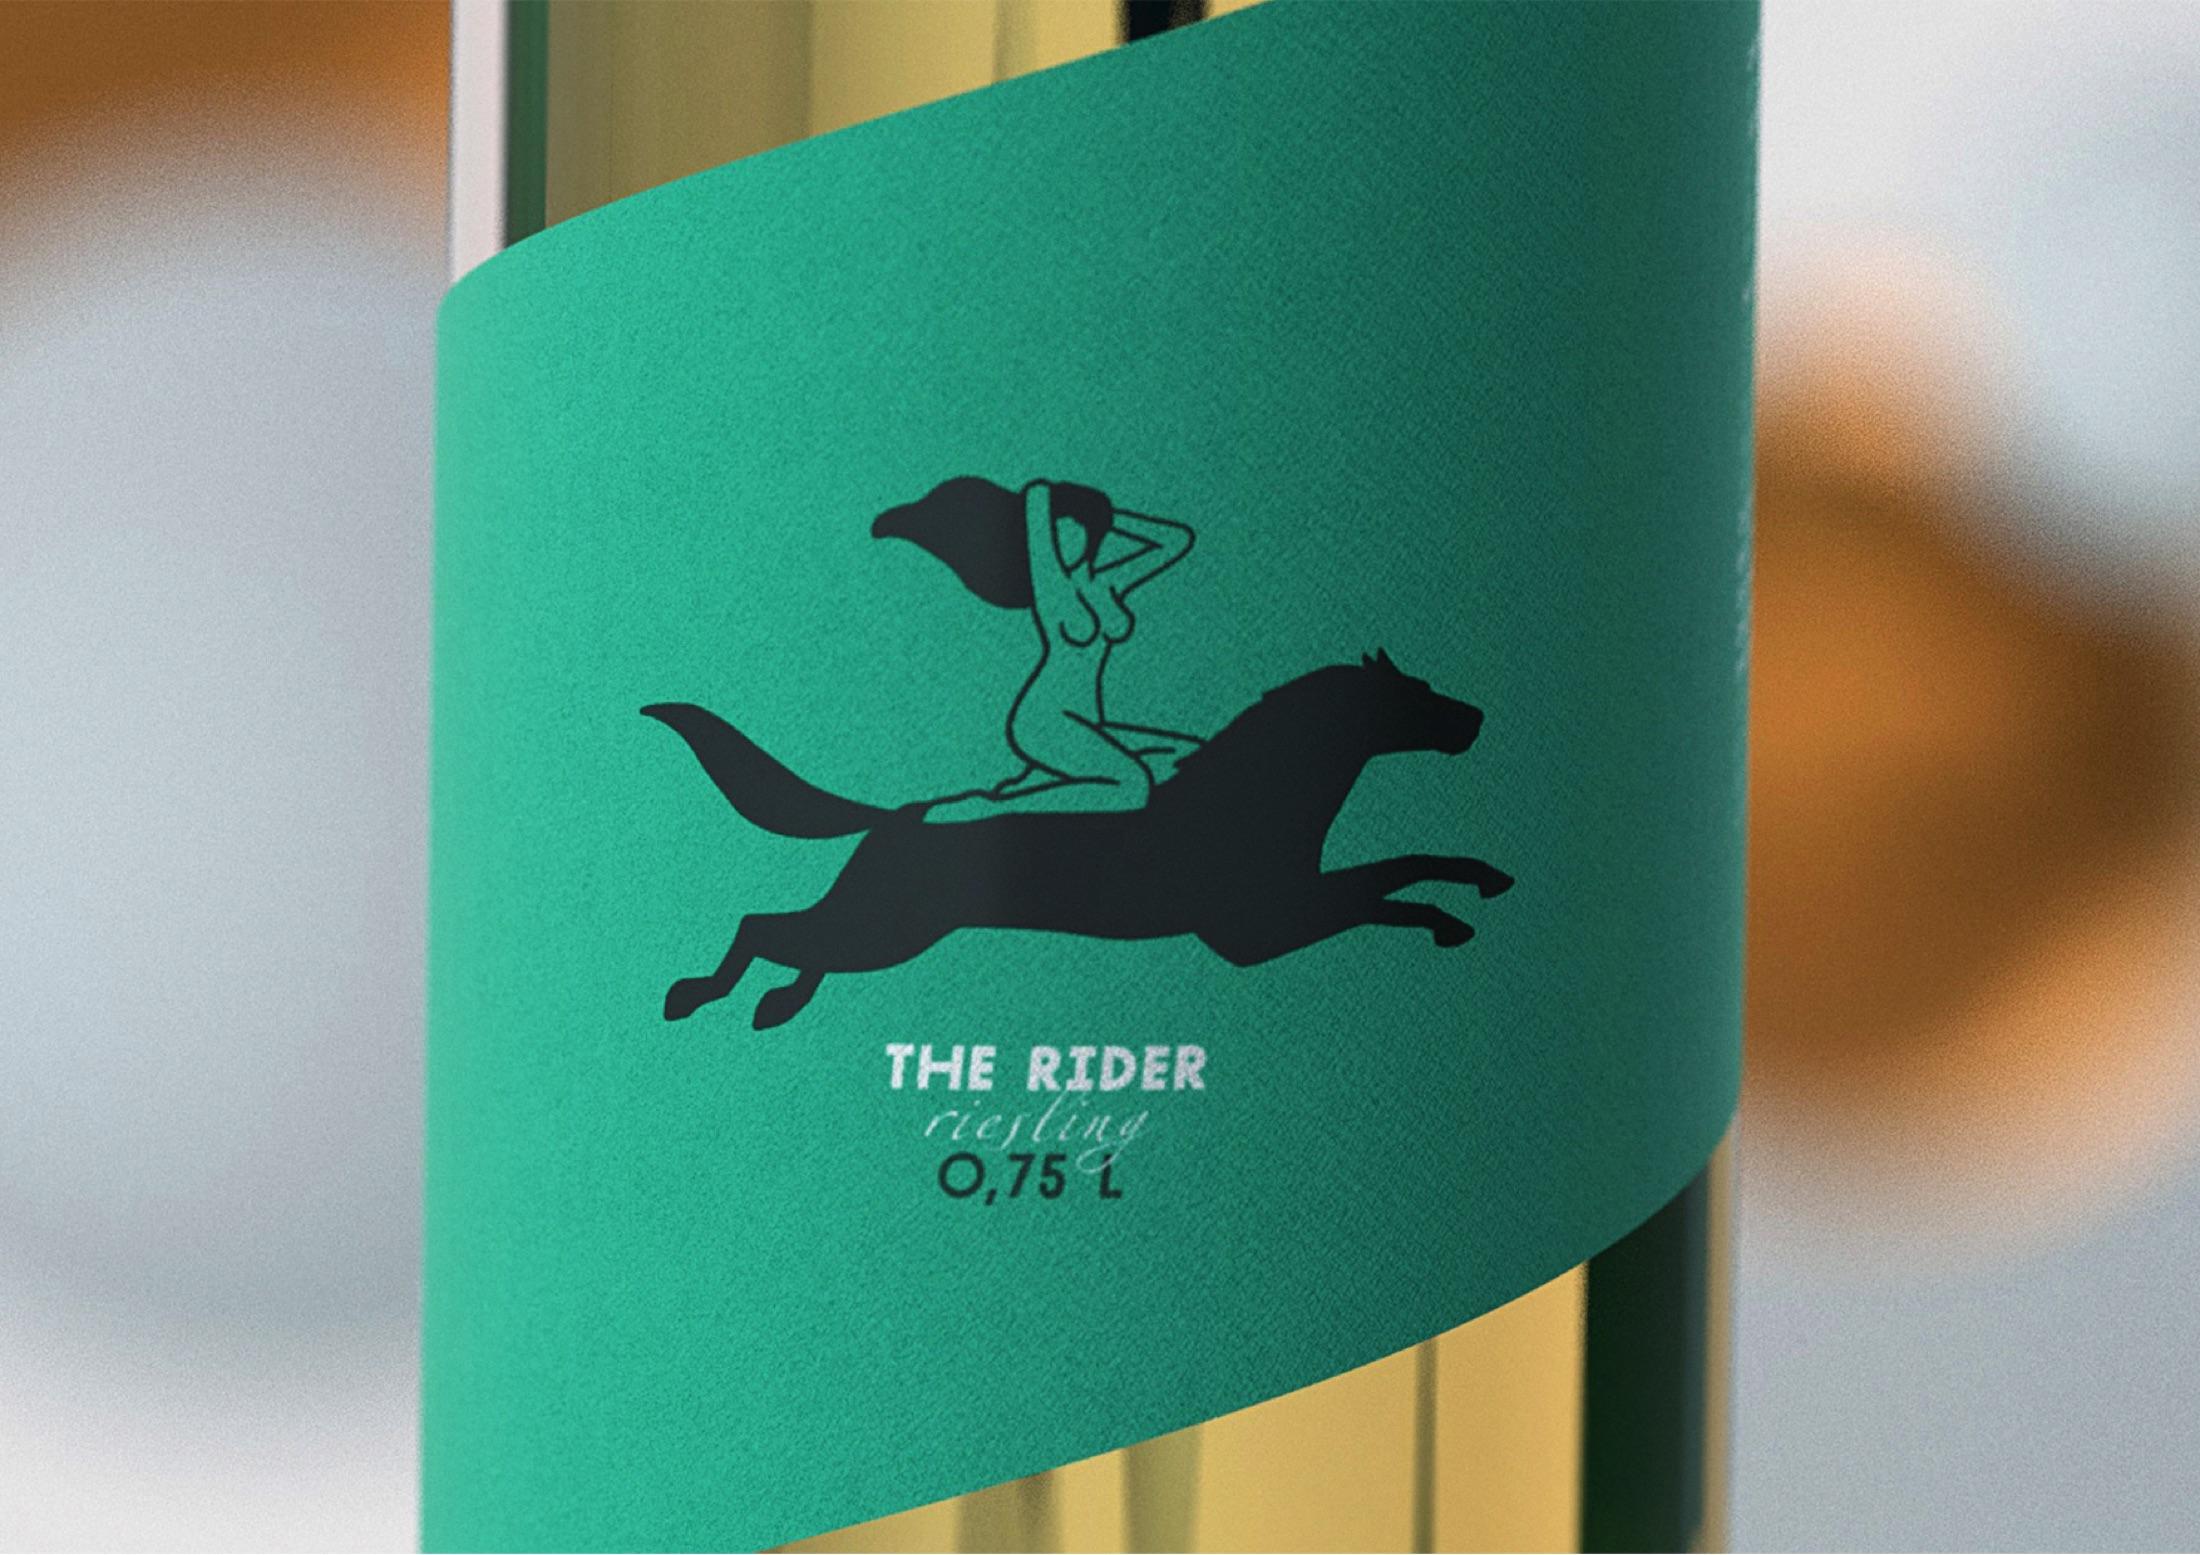 Kolonist Design Ad - The Rider